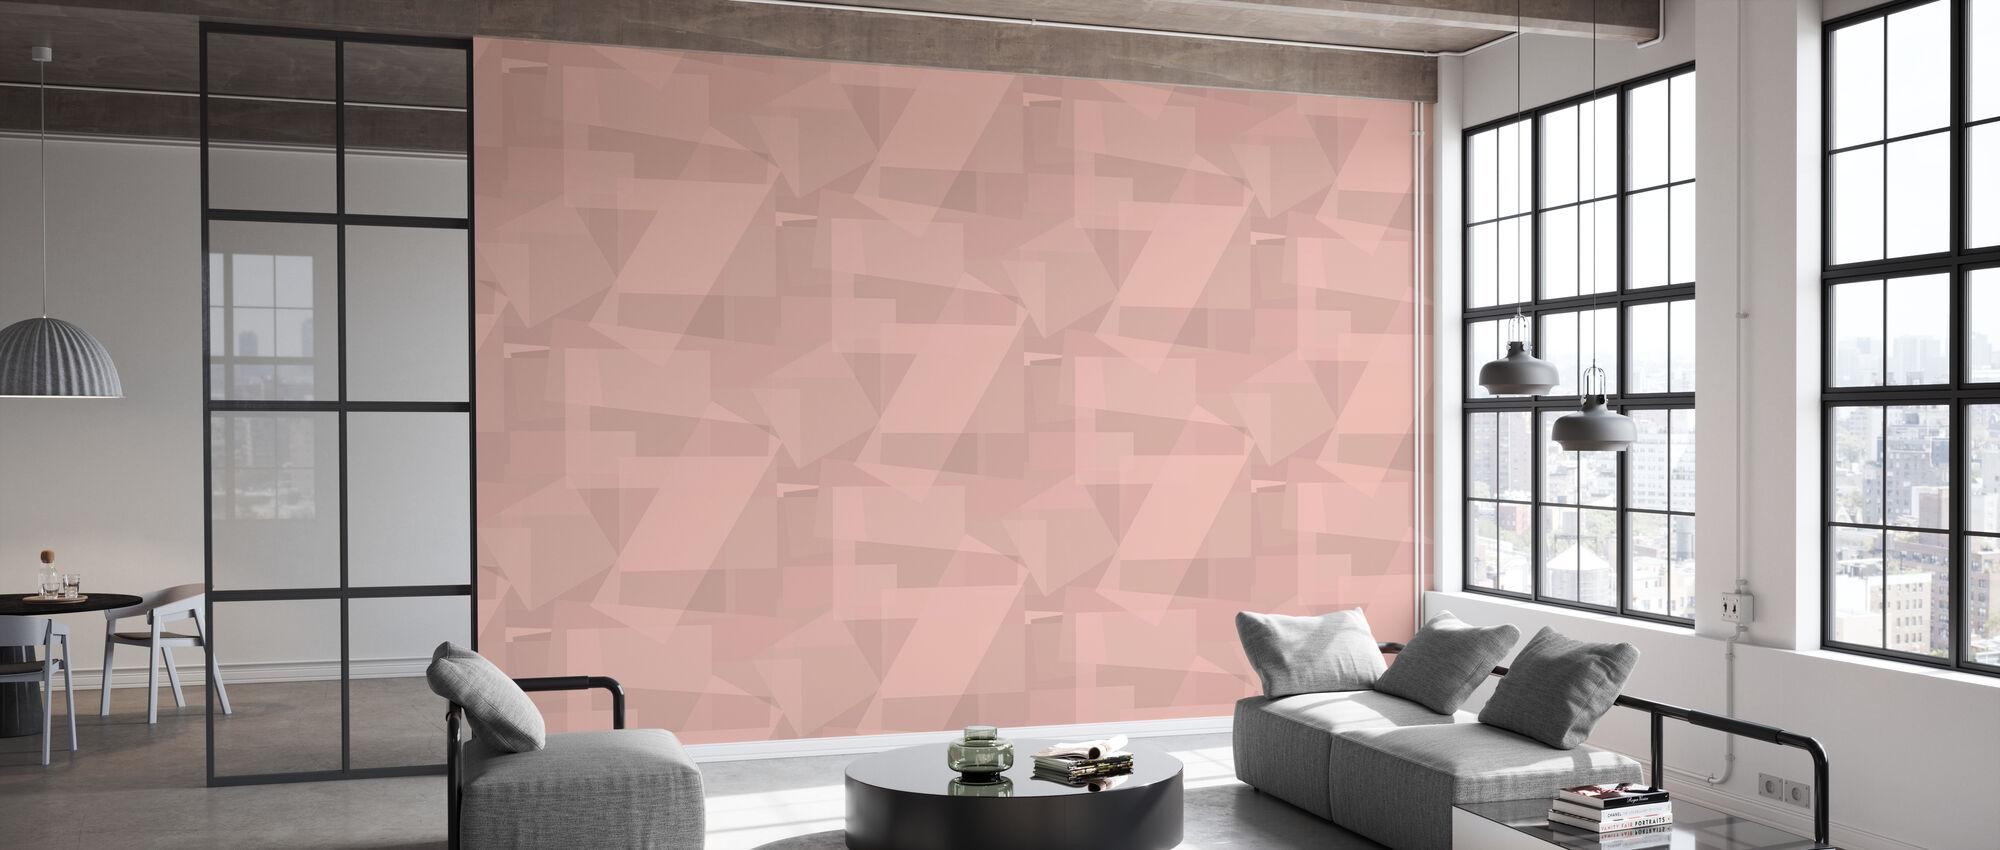 Block Powder - Wallpaper - Office